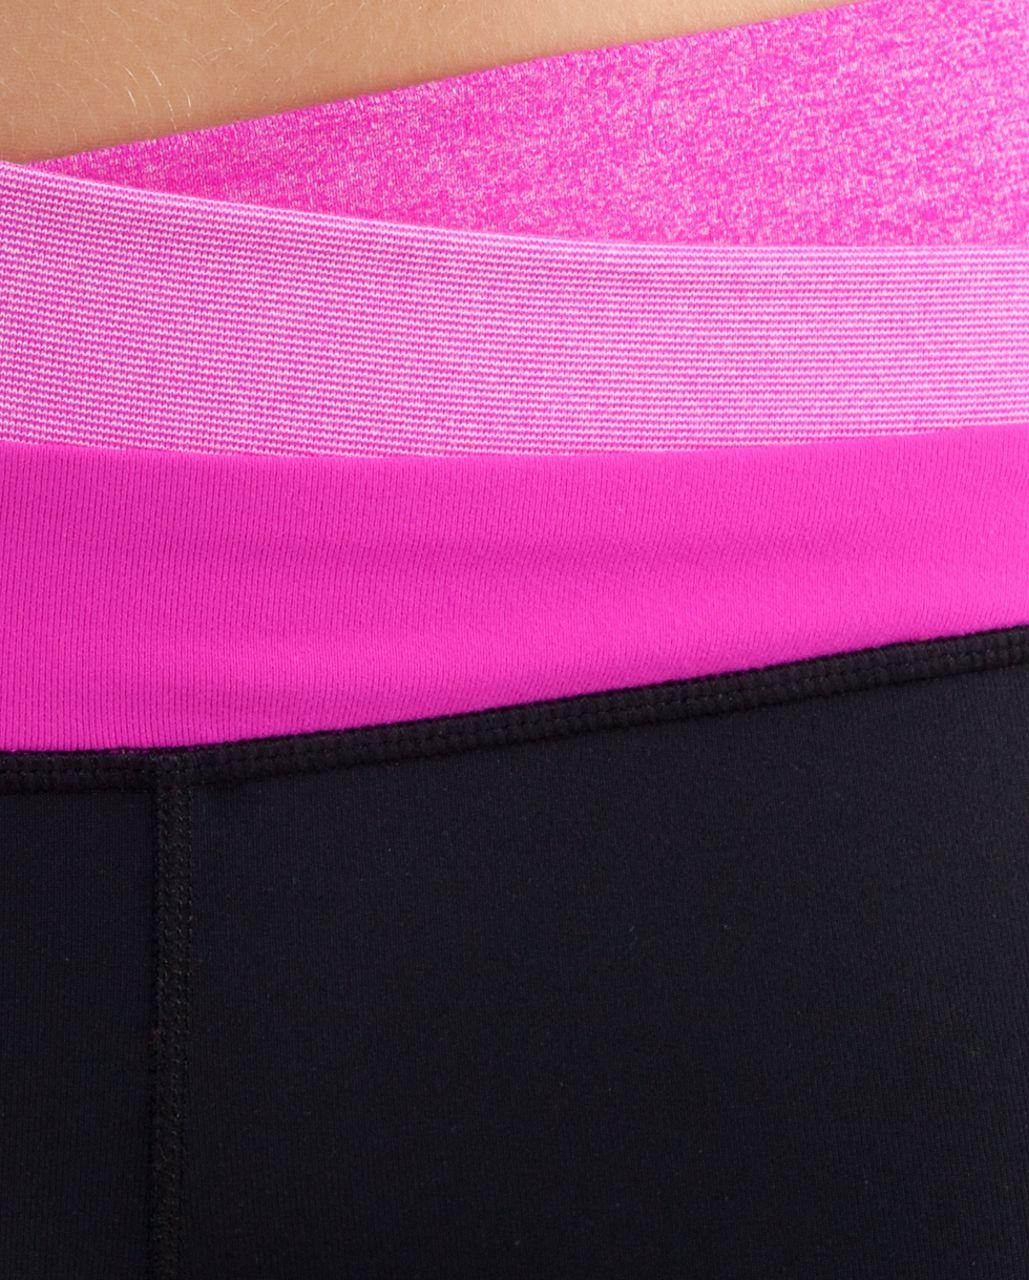 Lululemon Astro Wunder Under Crop - Black /  Heathered Paris Pink /  Paris Pink White Microstripe